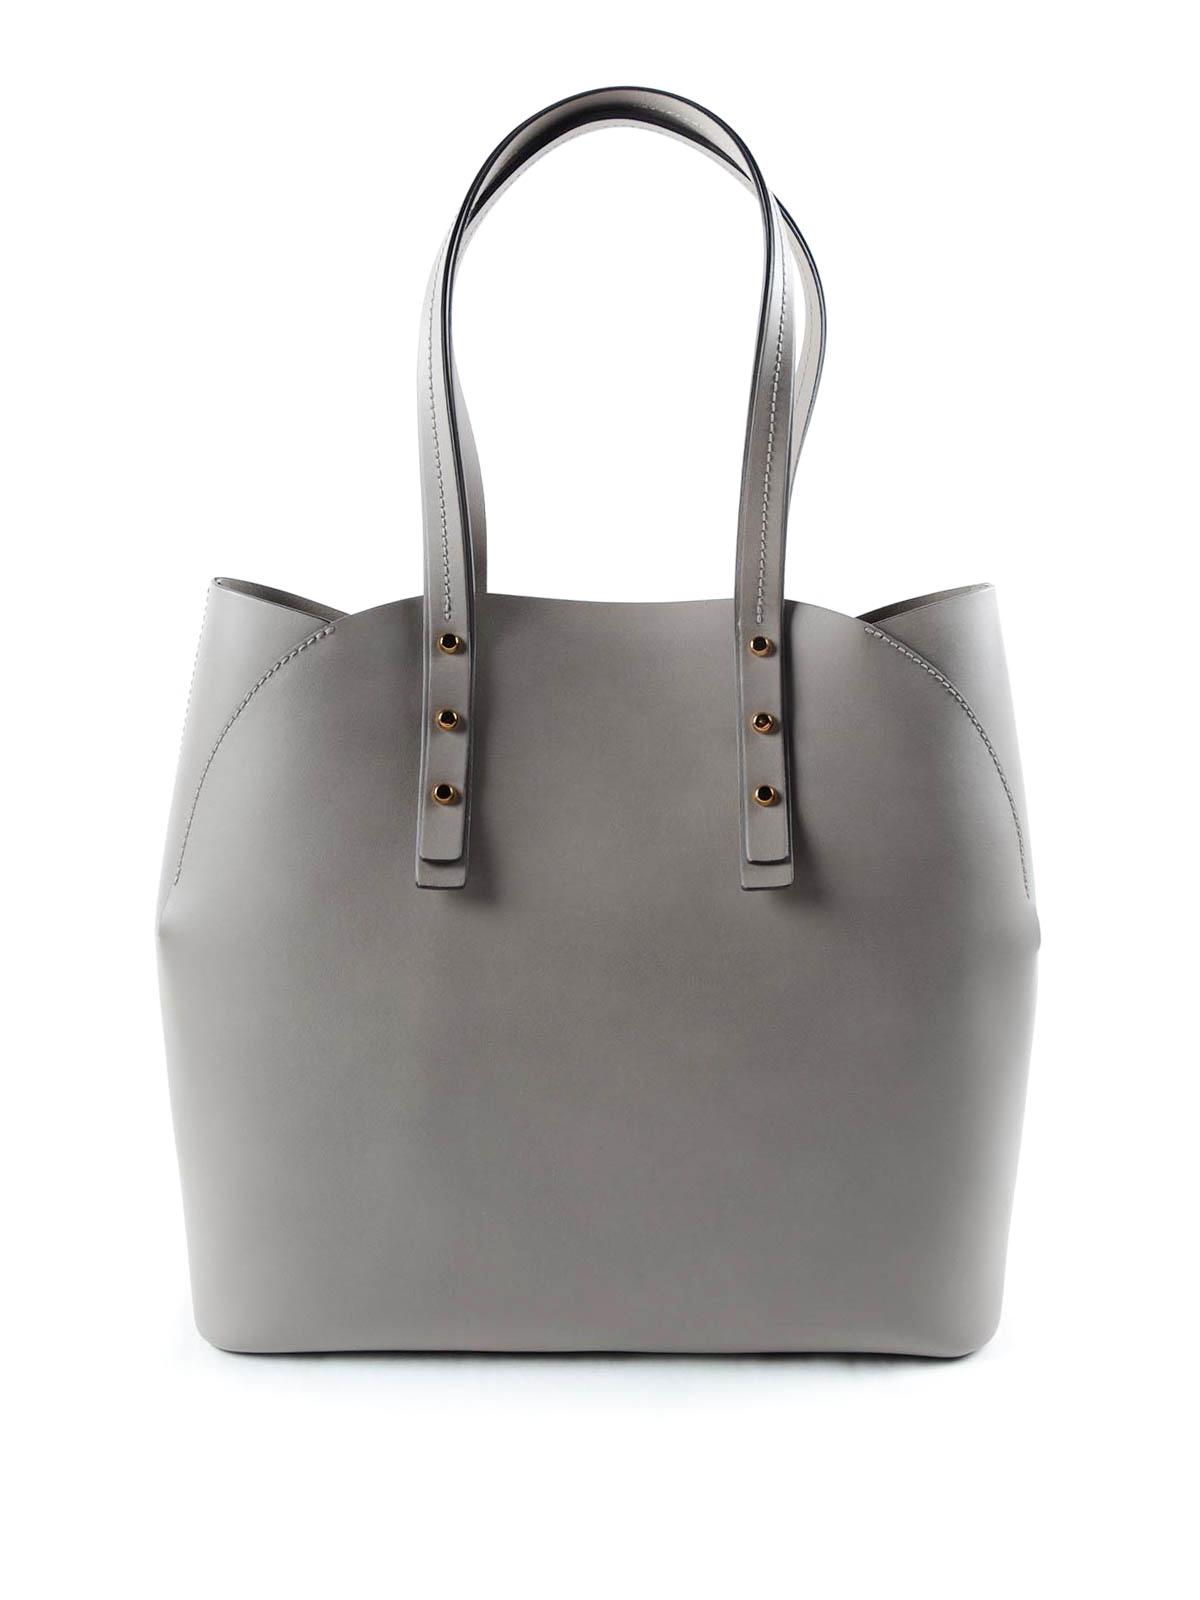 Furla - Aurora leather tote bag - totes bags - 851976 SABBIA  c0ead9cb90759